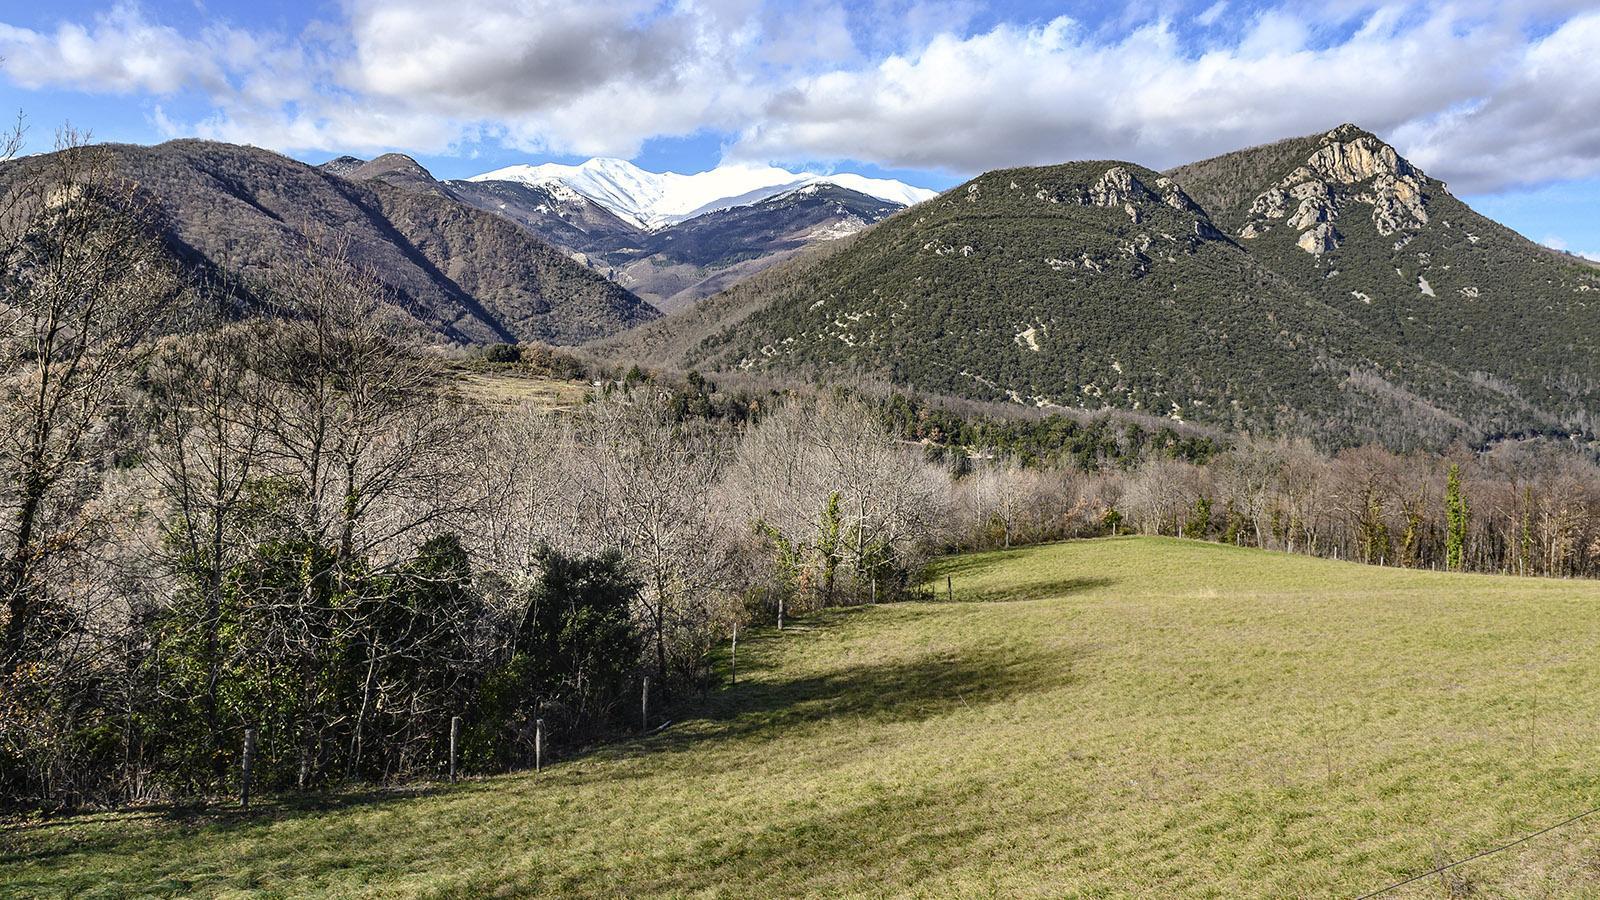 Serralongue: Ausblicke auf den Canigou. Foto: Hilke Maunder